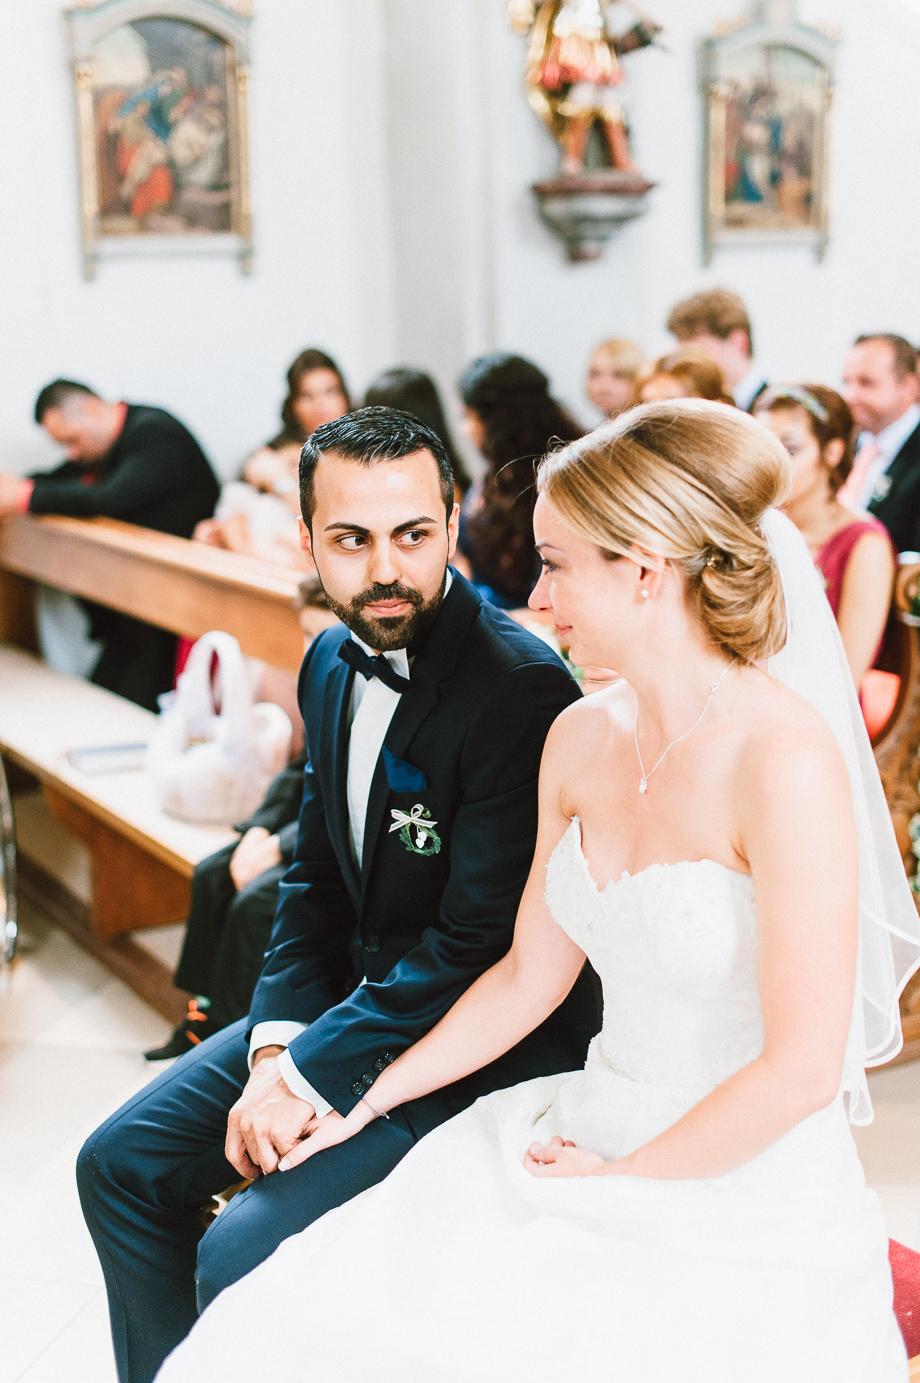 Hochzeit_Kolbermoor_Alte_Spinnerei_Modern_Brautpaar_Multikulturell_Laura_Elena_Photography_027